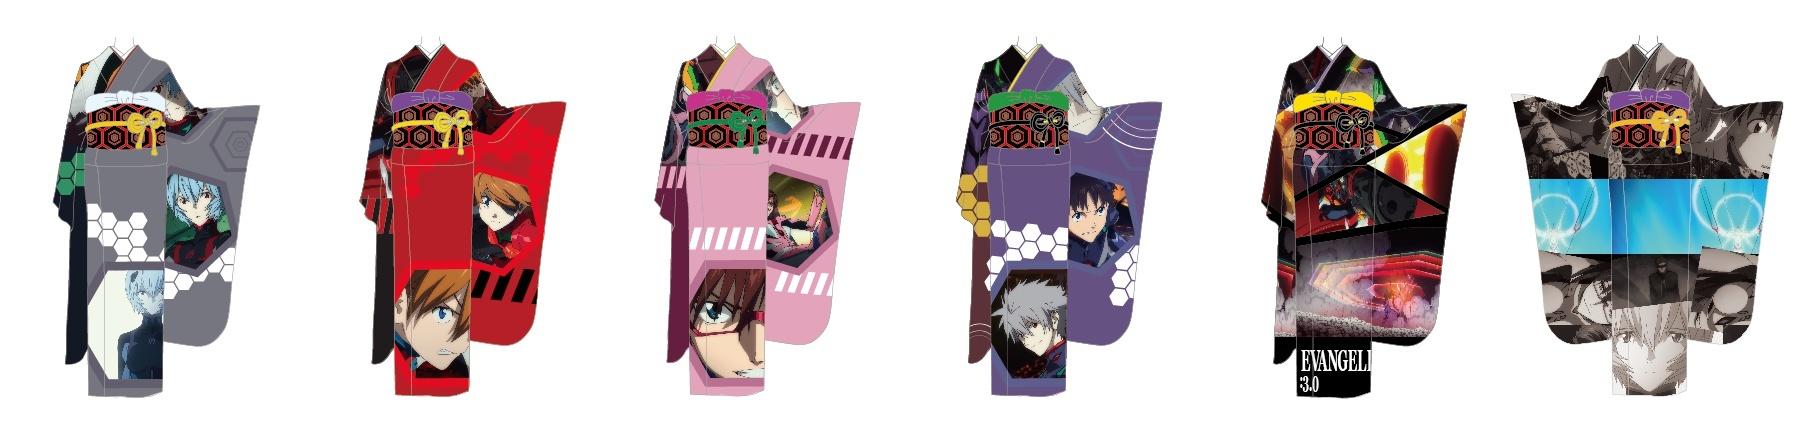 Tokyo Otaku Mode Launches Full Graphic Evangelion Kimono Project!